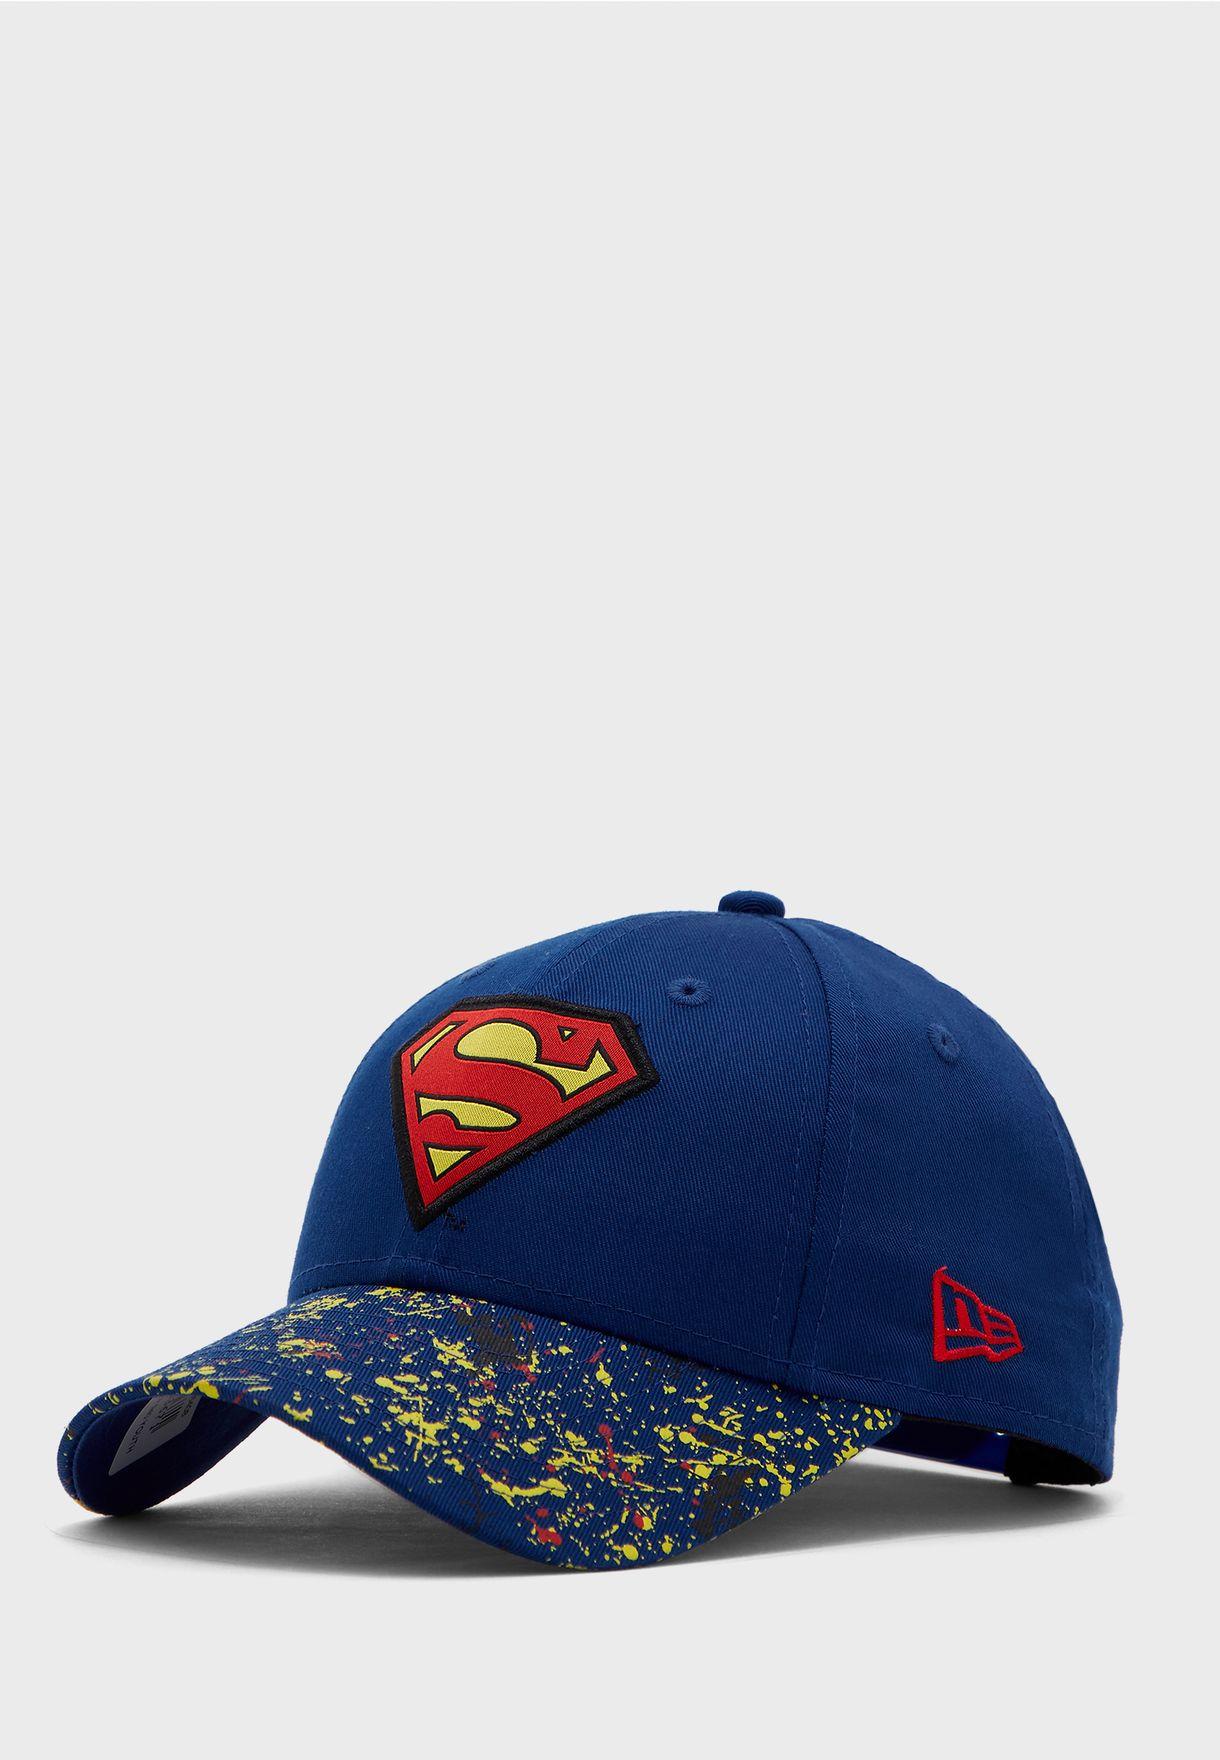 9Forty Warner Bros Superman Cap